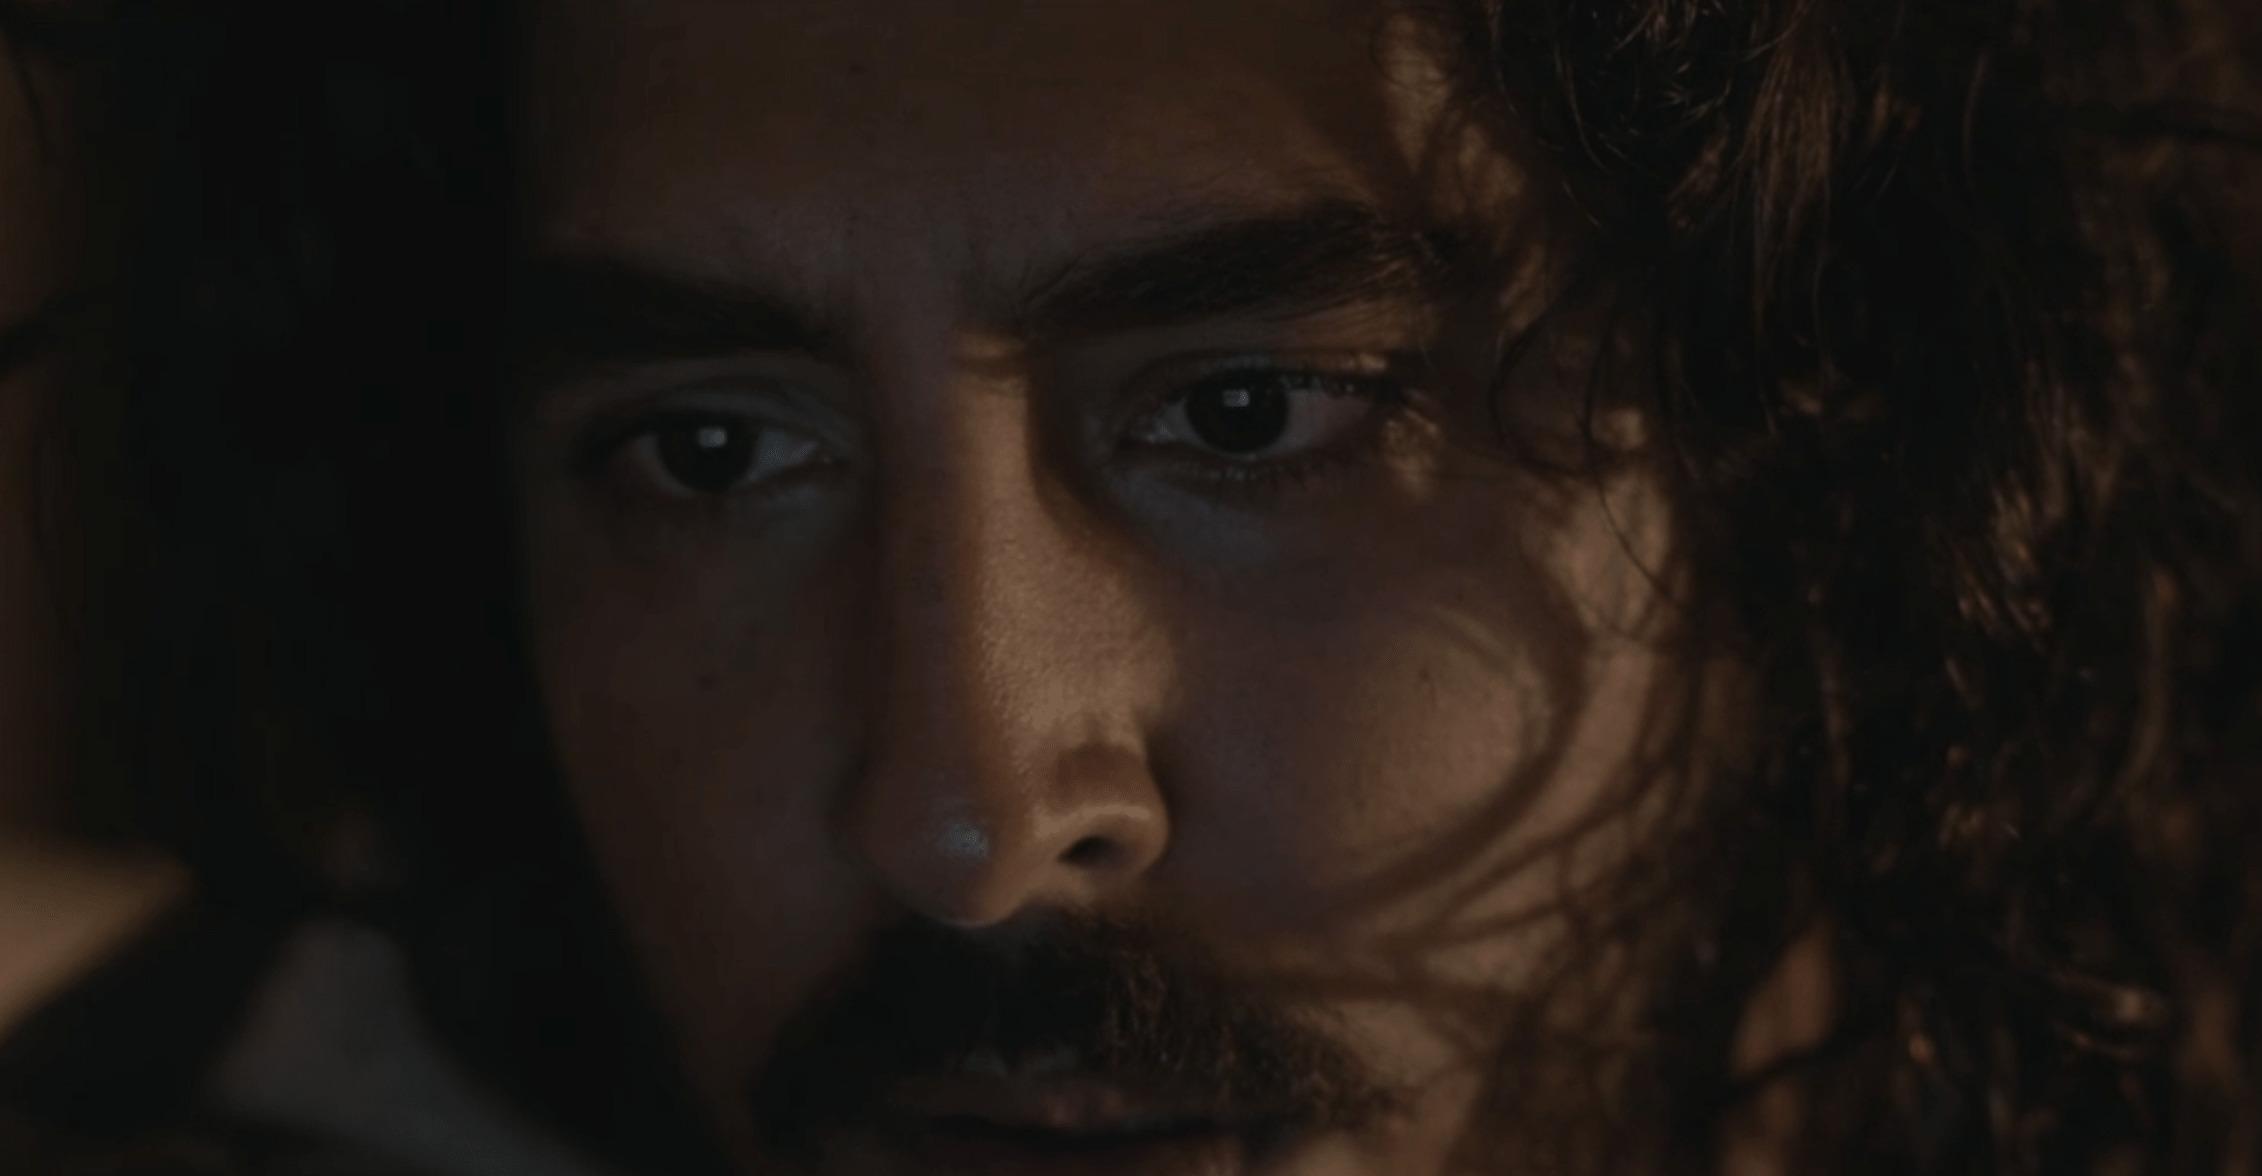 LION/ライオン 25年目のただいまを無料動画でネタバレ紹介する記事